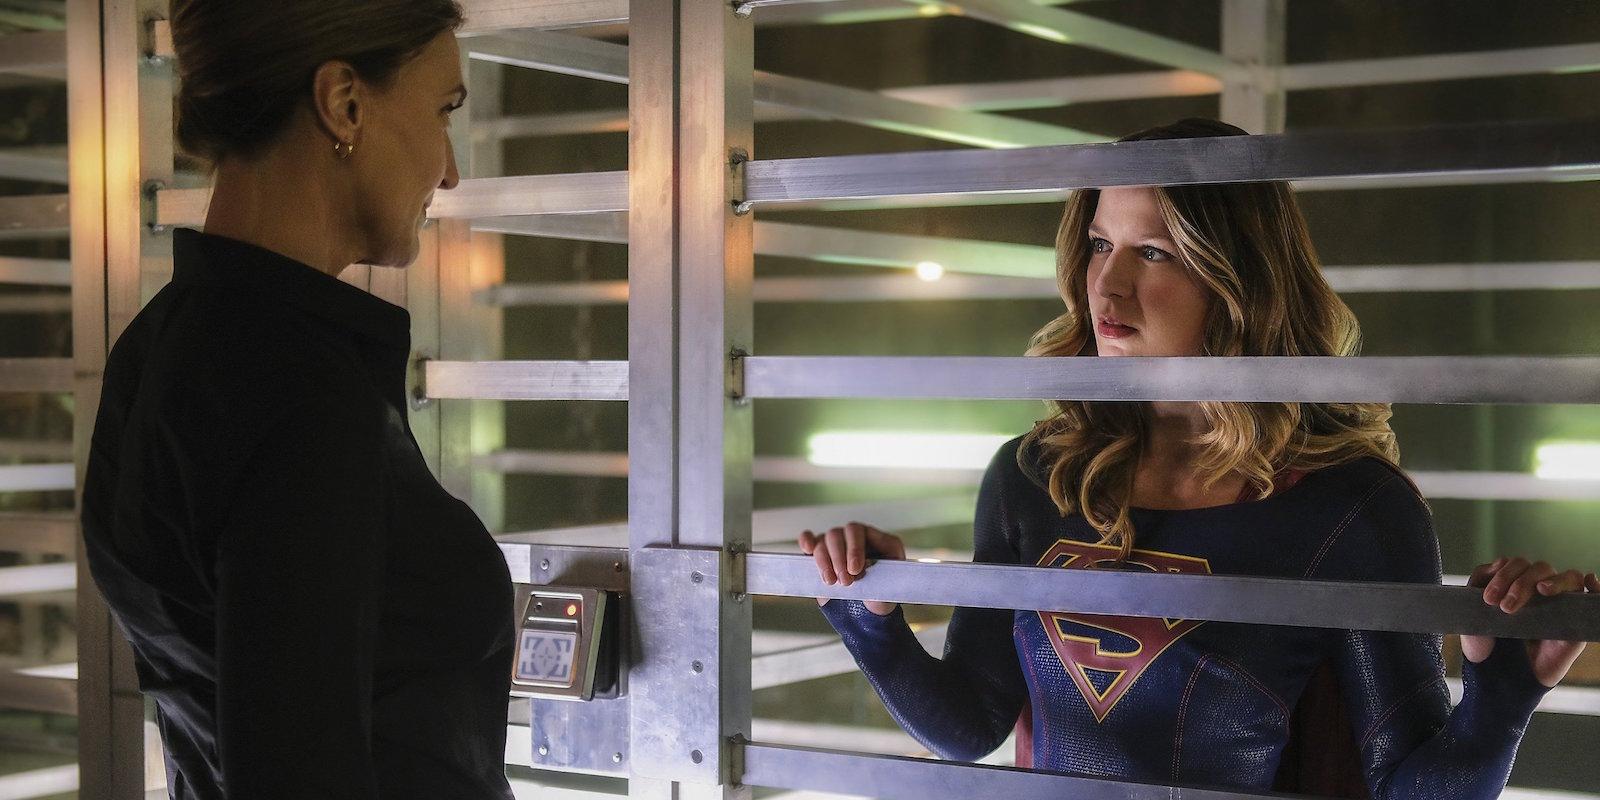 supergirl-the-darkest-place-melissa-benoist-brenda-strong